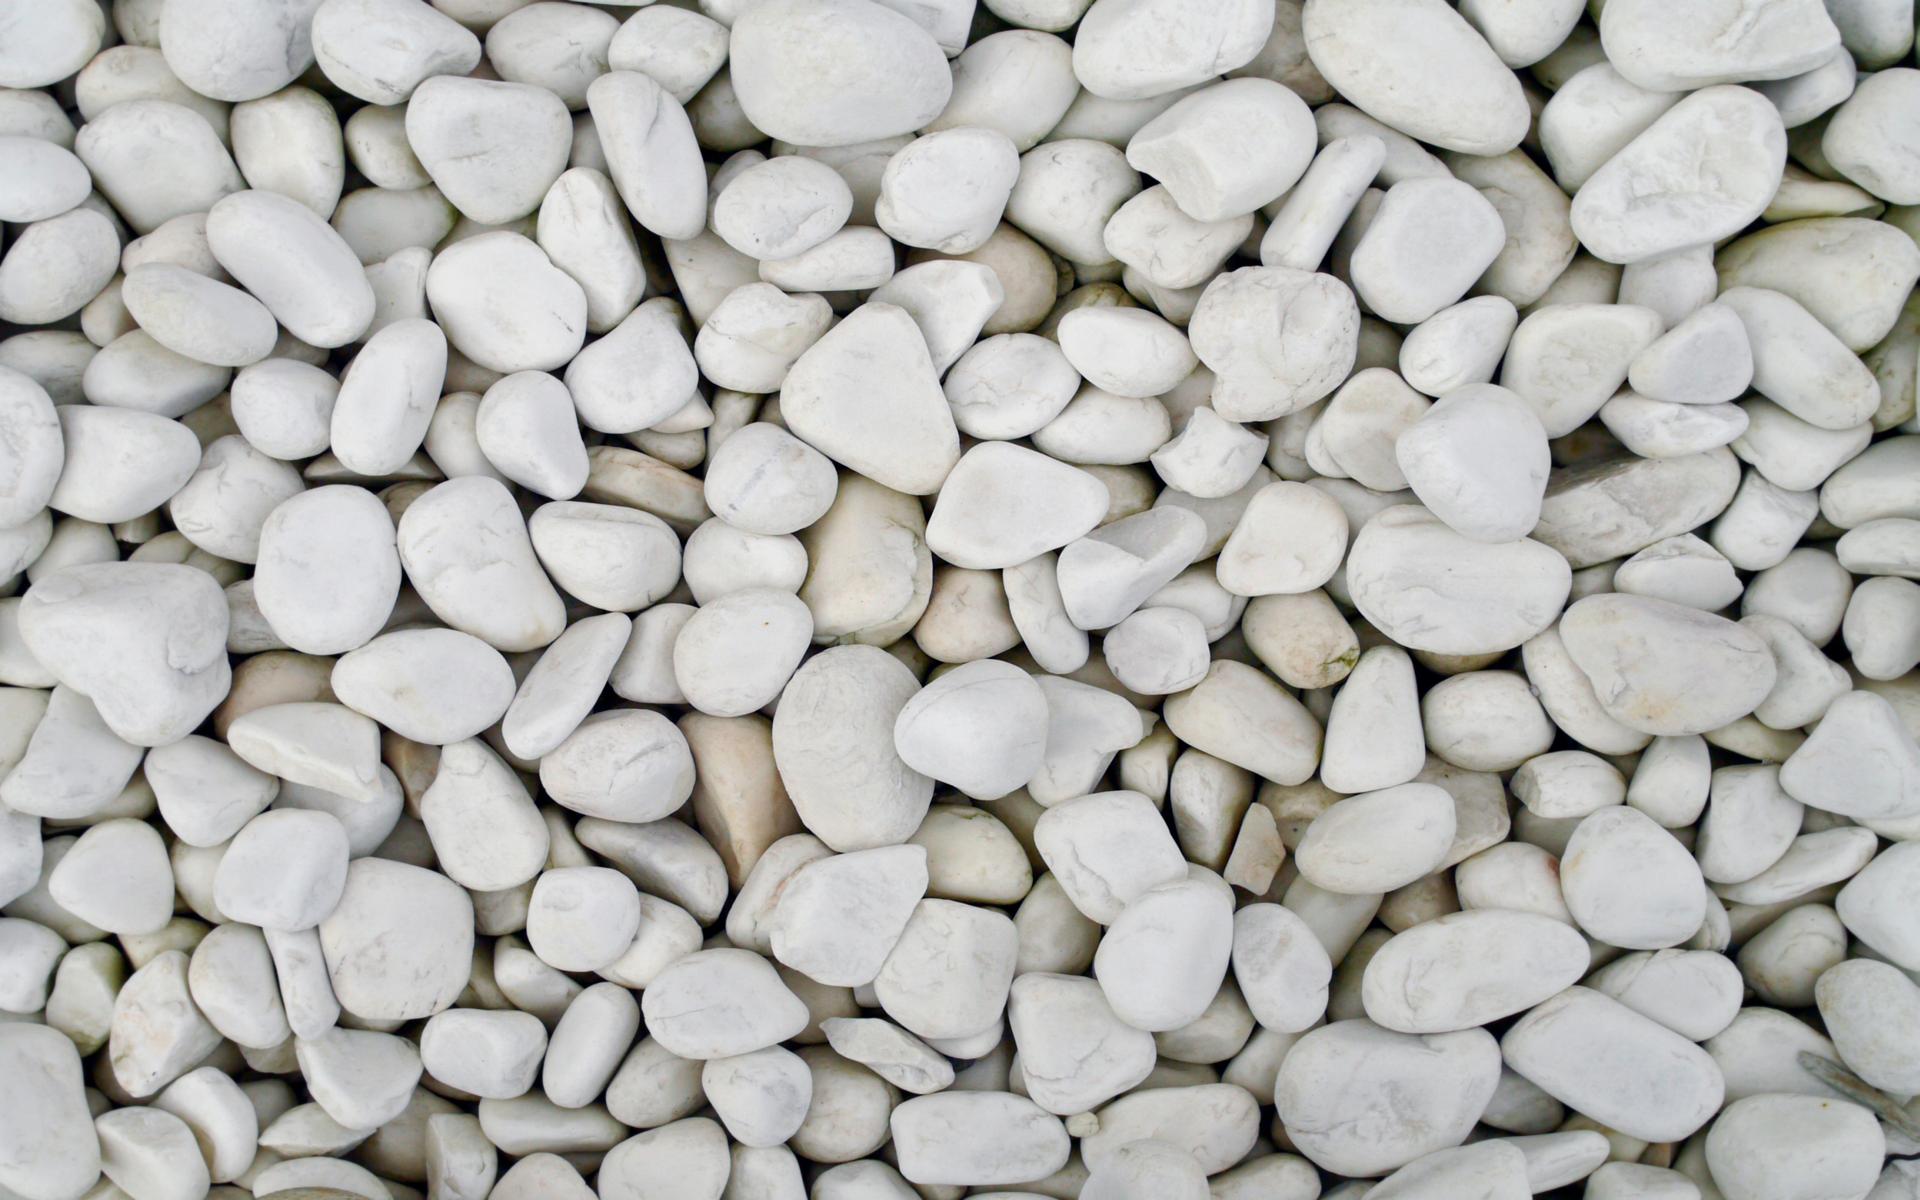 White Marble Rock : White stone wallpaper wallpapersafari